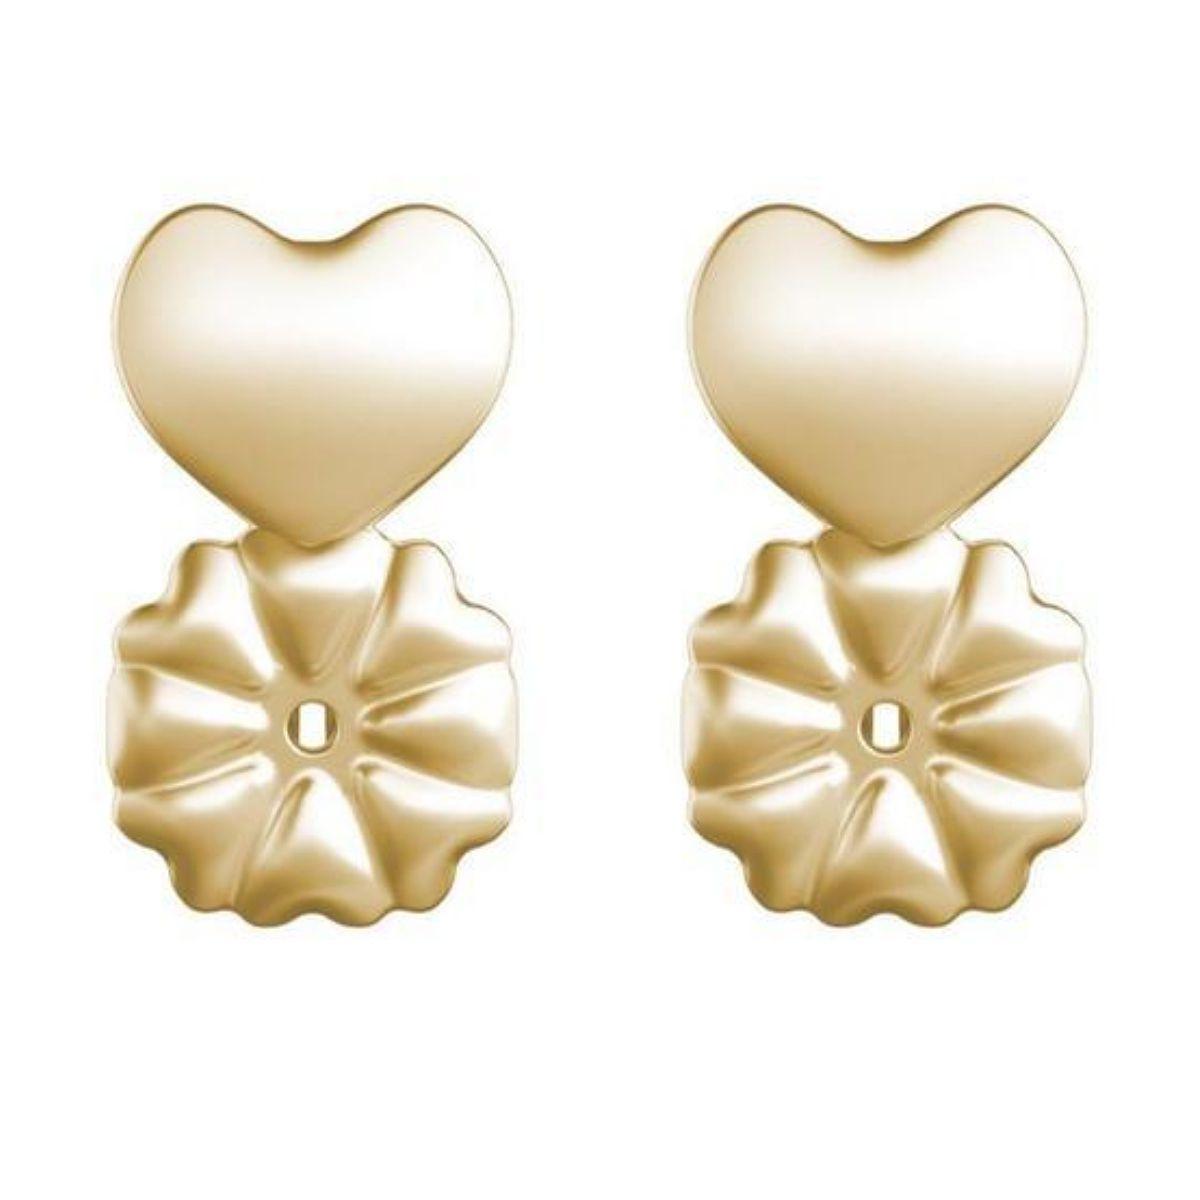 Ear Cuff Palito de Zircônia Turquesa Semijoia Fina Ouro Rosé  - Soloyou